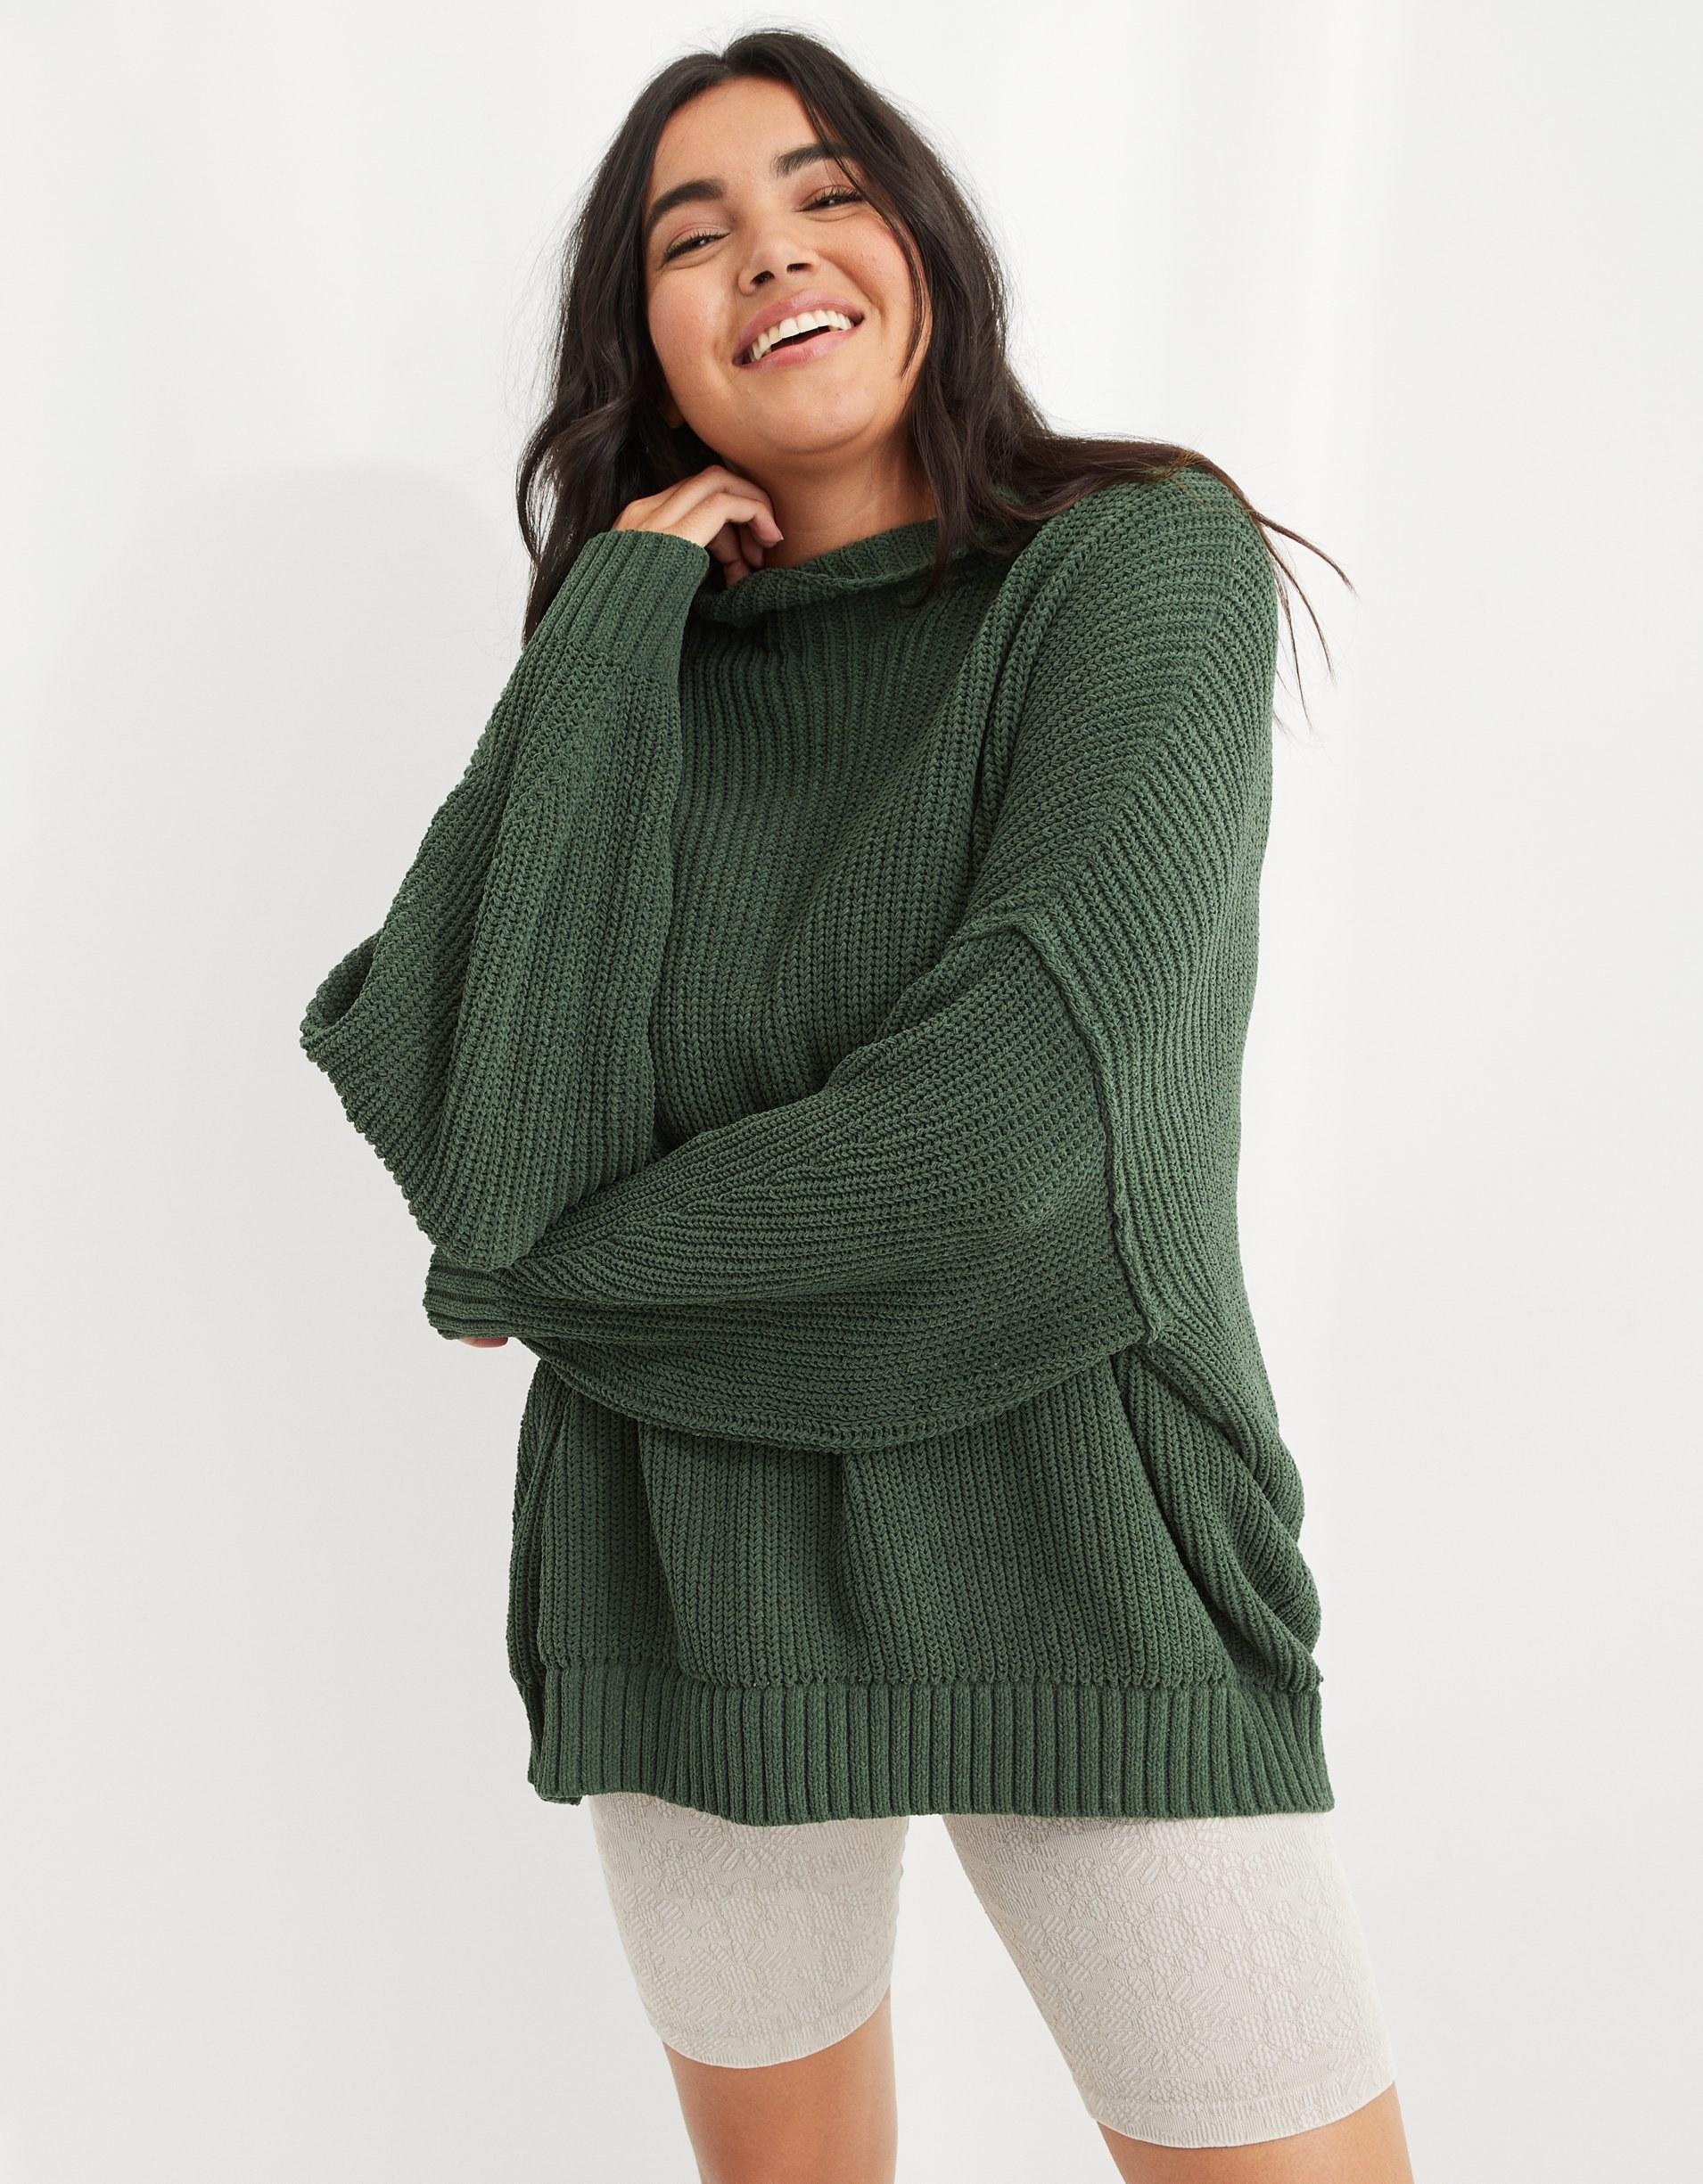 model wearing the sweater in green